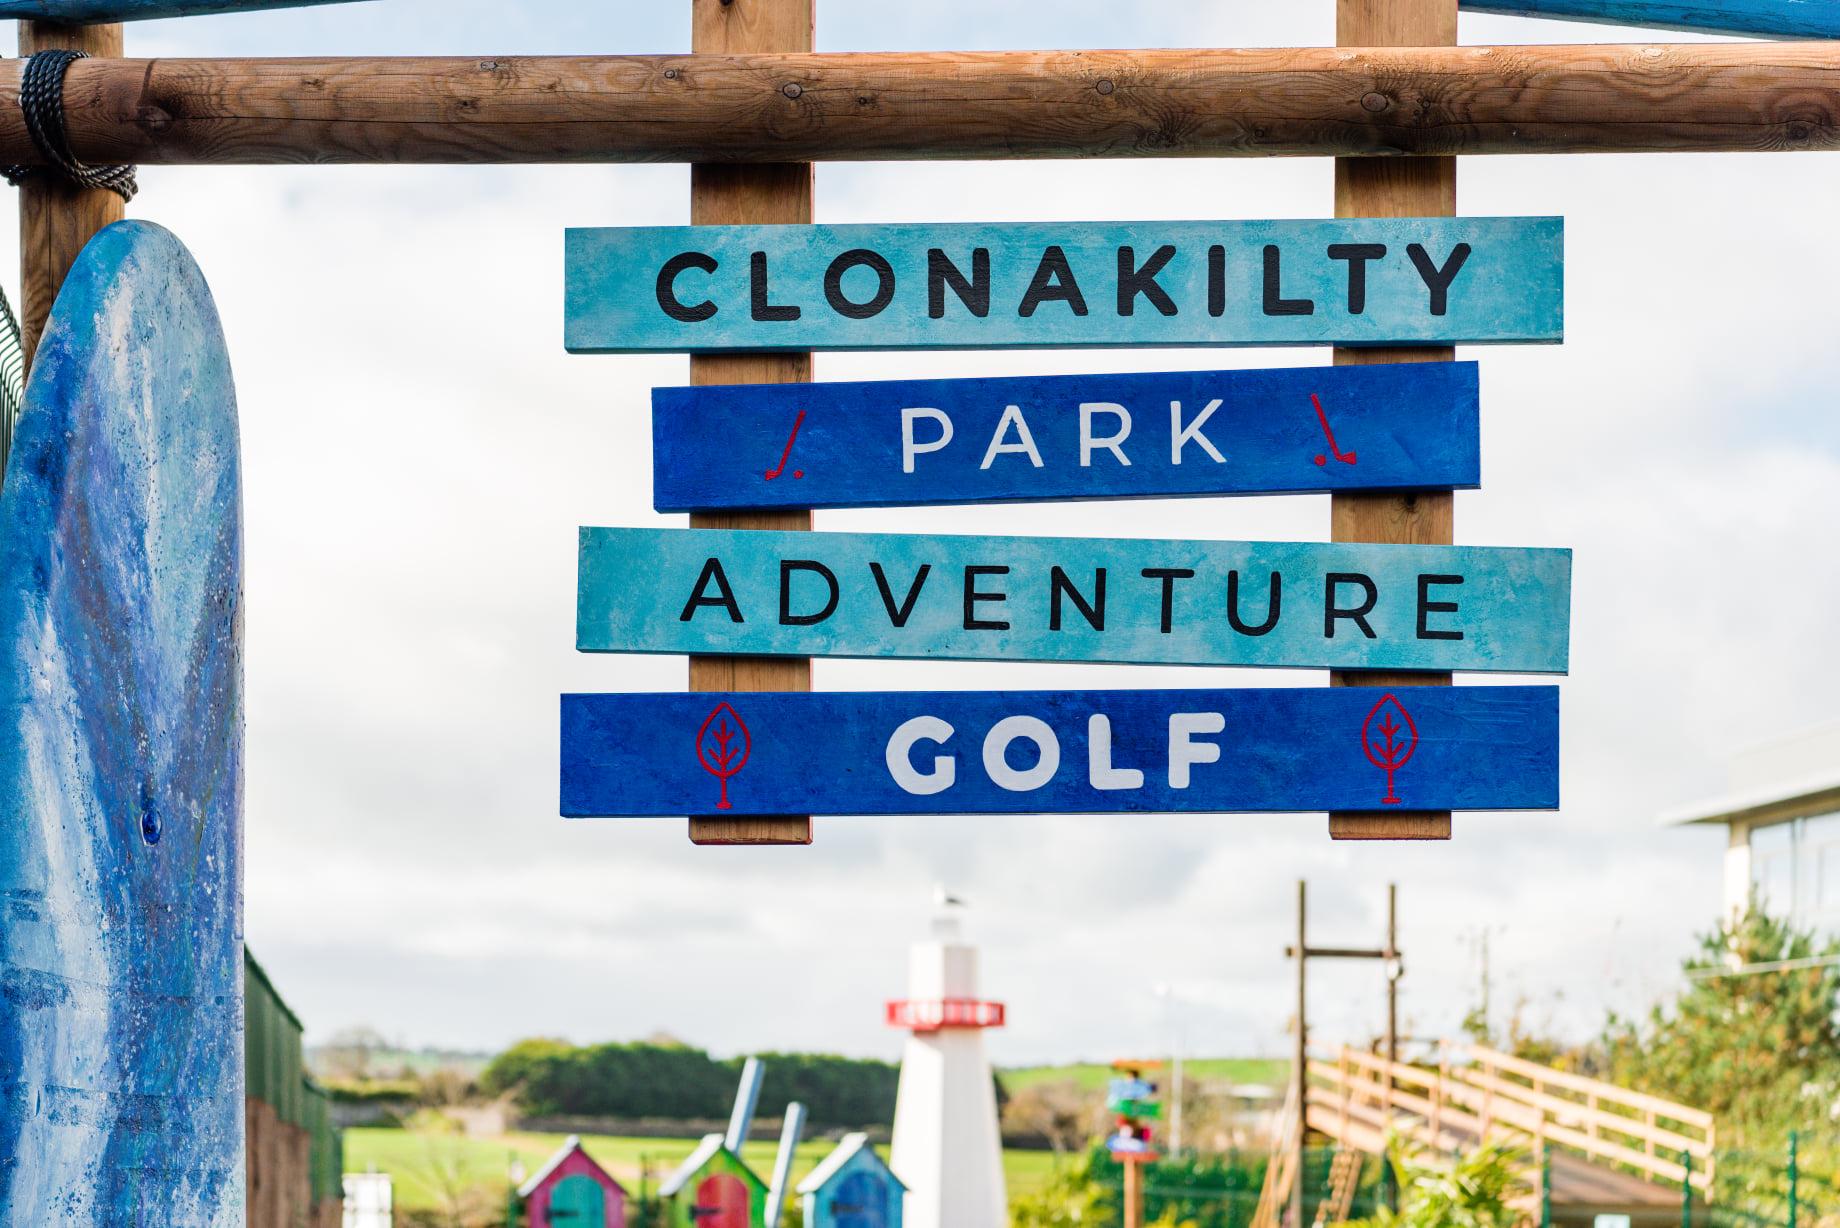 Mini Golf Course Maritime Theme Clonakilty Park Adventure Centre Co Cork Hennessy Outdoors